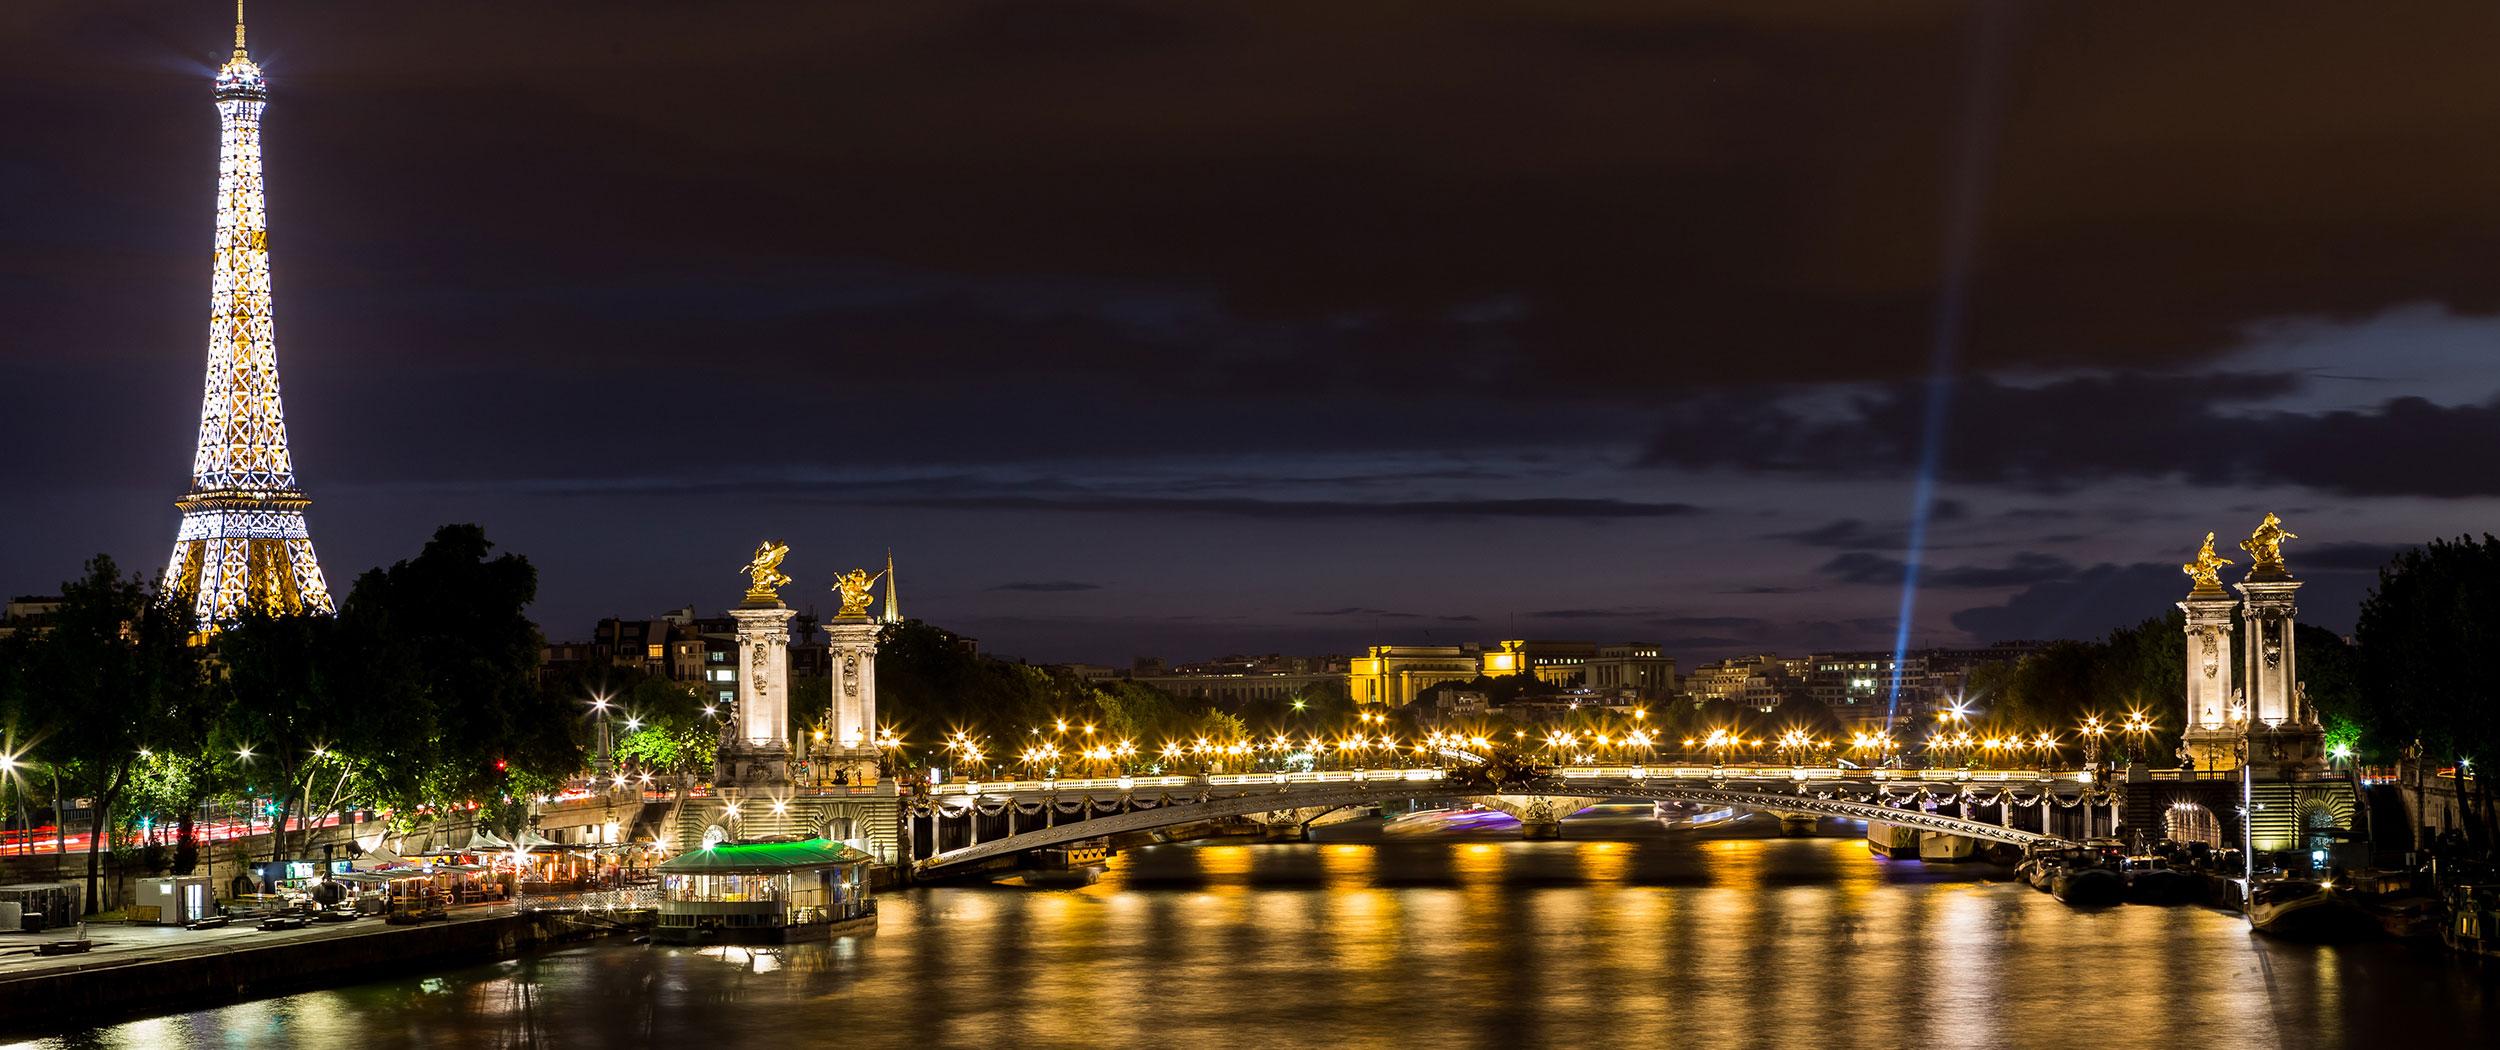 Illuminated Paris Tour By Van Private Chauffeur Guide Meet The Locals